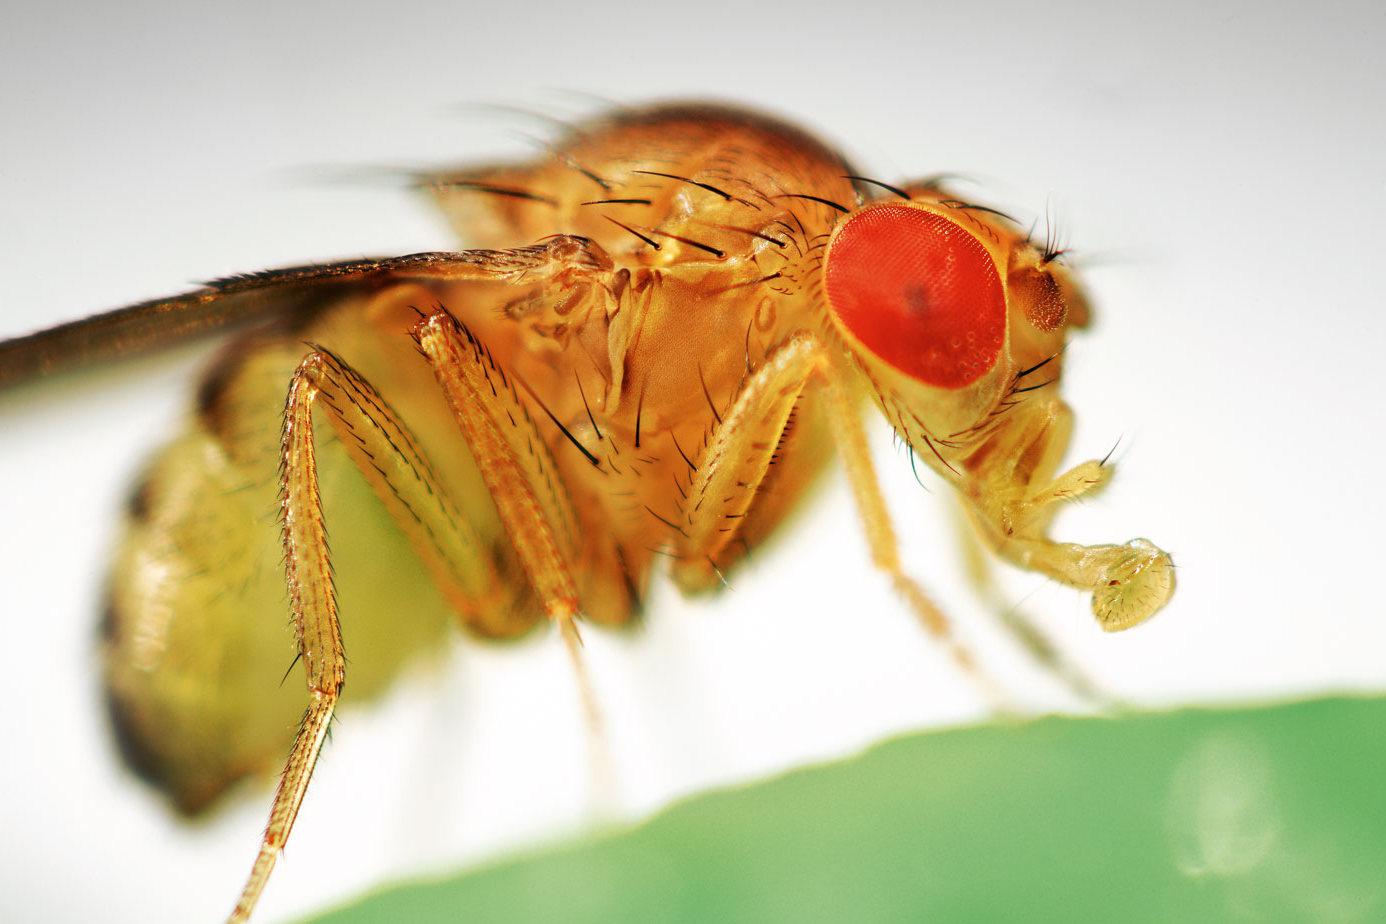 Белок Сестрин - мухи Дрозофилы